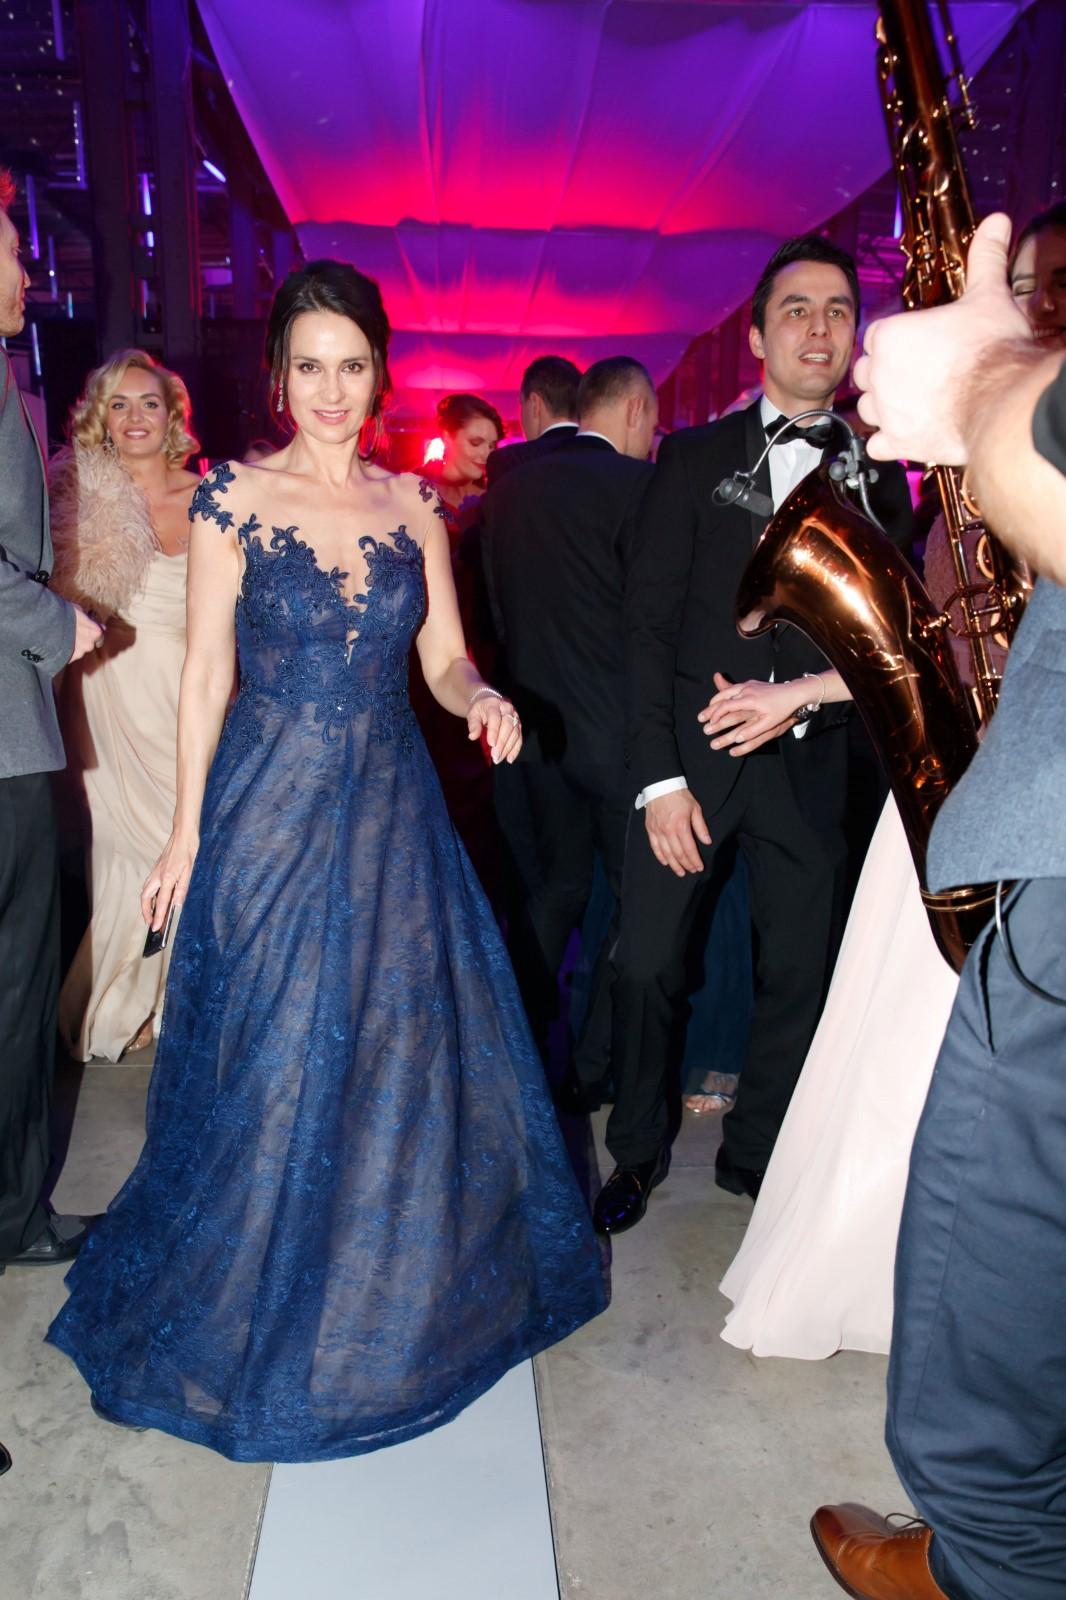 Ples jako Brno